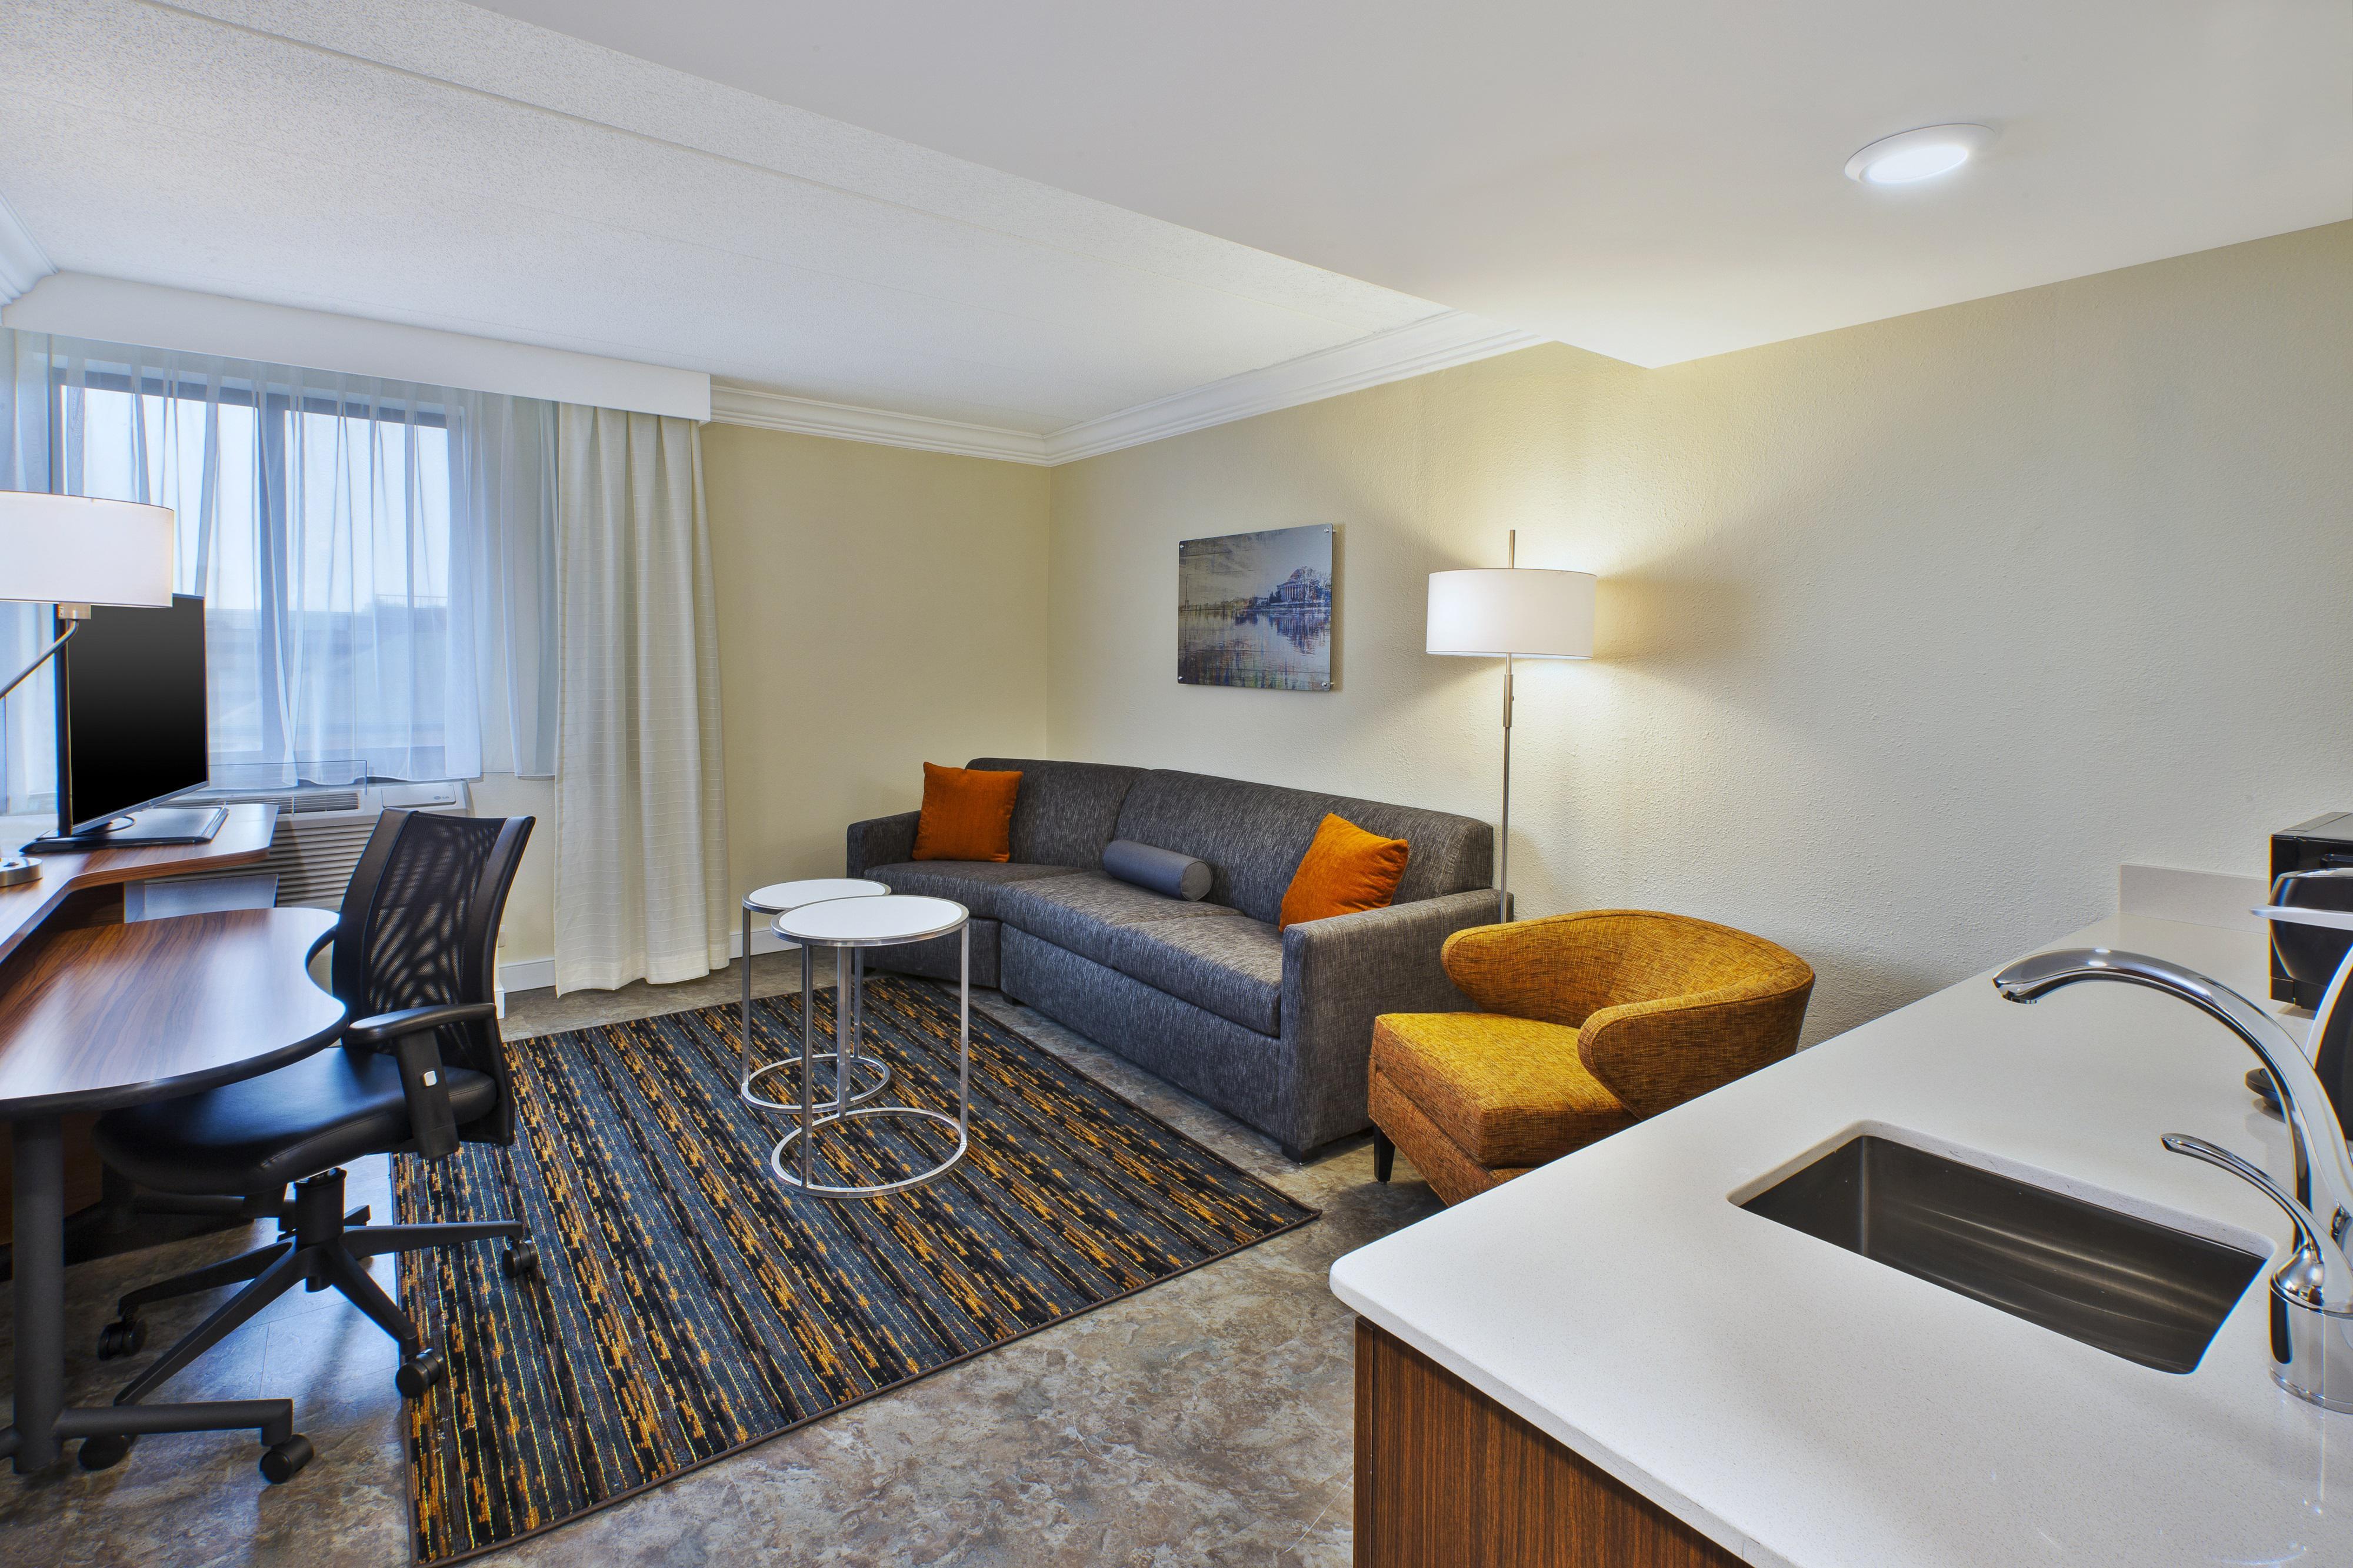 Fairfield Inn & Suites by Marriott Dulles Airport Herndon/Reston image 11